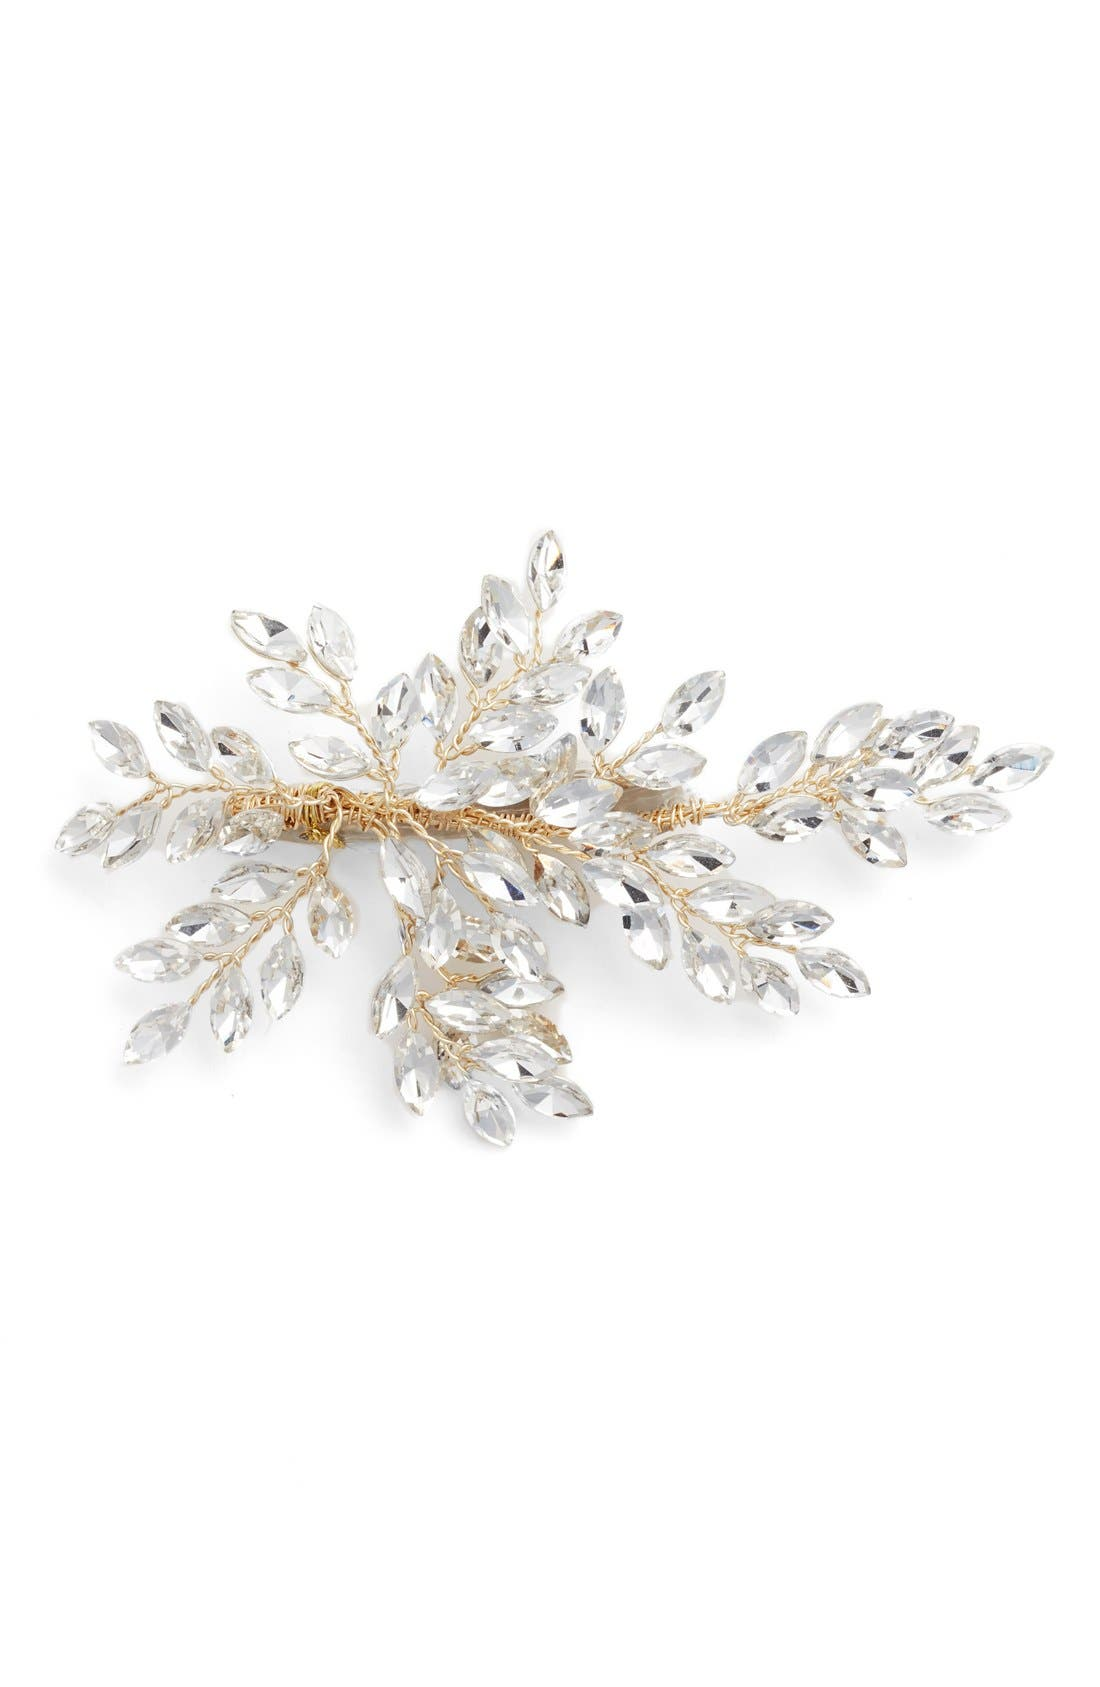 BRIDES & HAIRPINS, 'Sahara' Crystal Leaf Bendable Hair Clip, Main thumbnail 1, color, GOLD